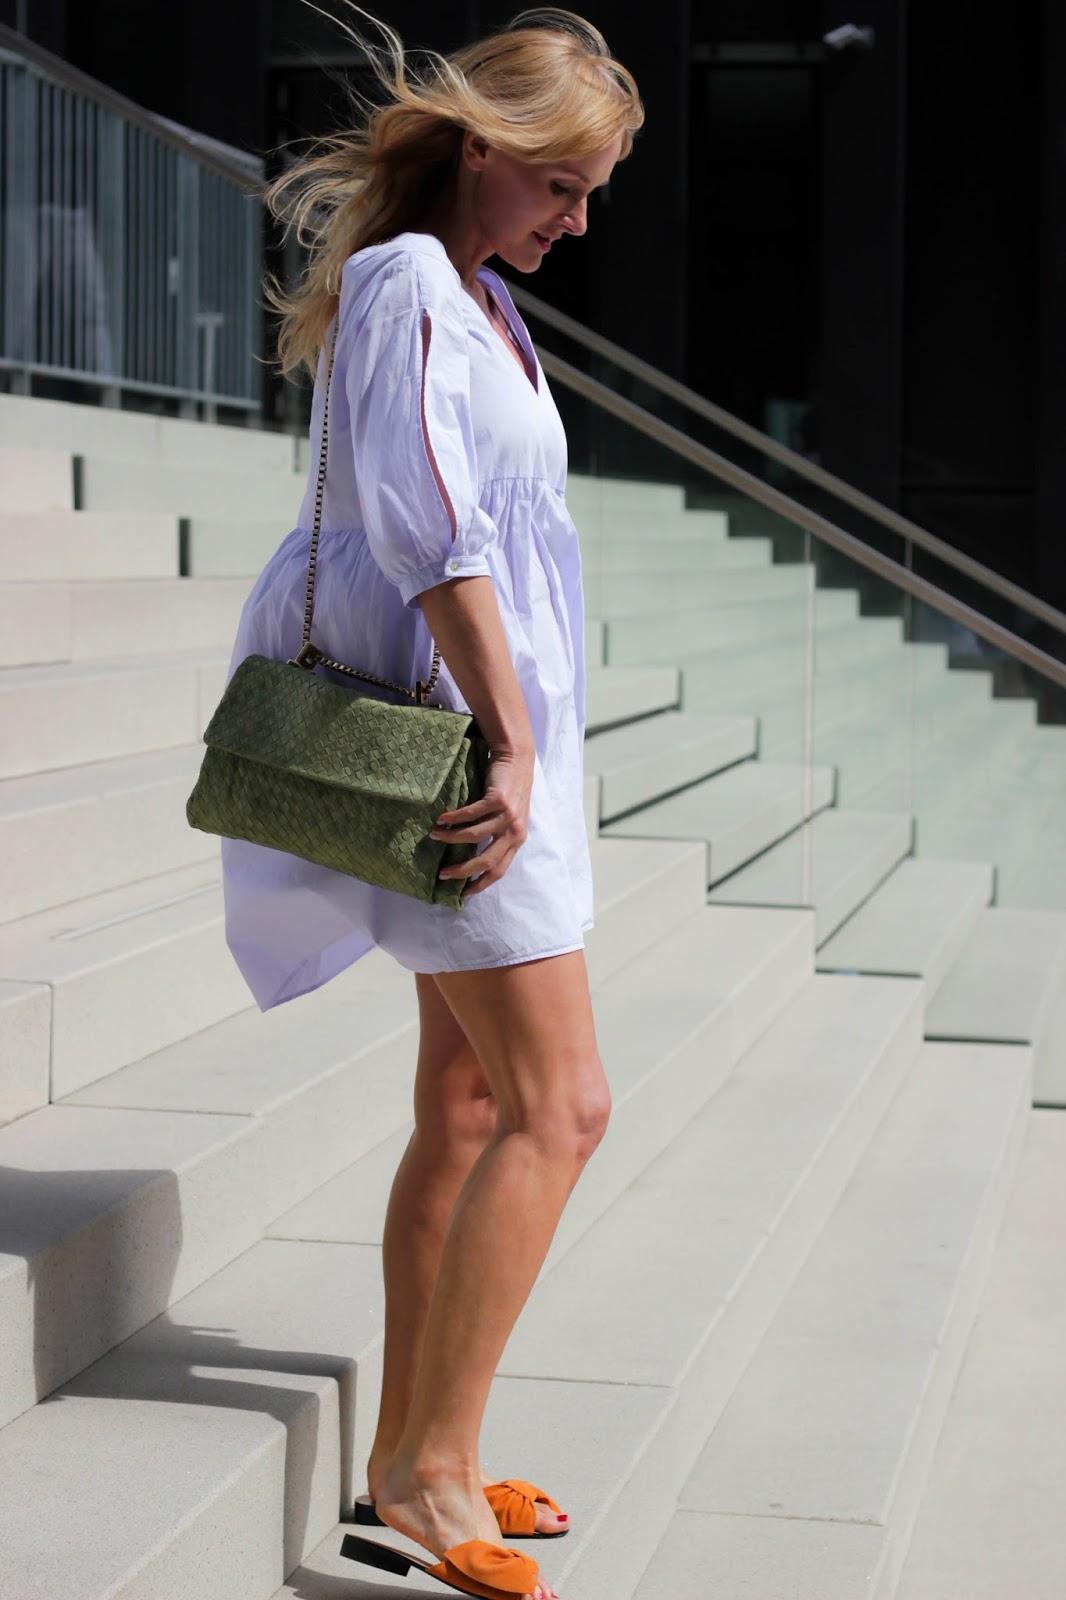 over 40 Fashion Blog